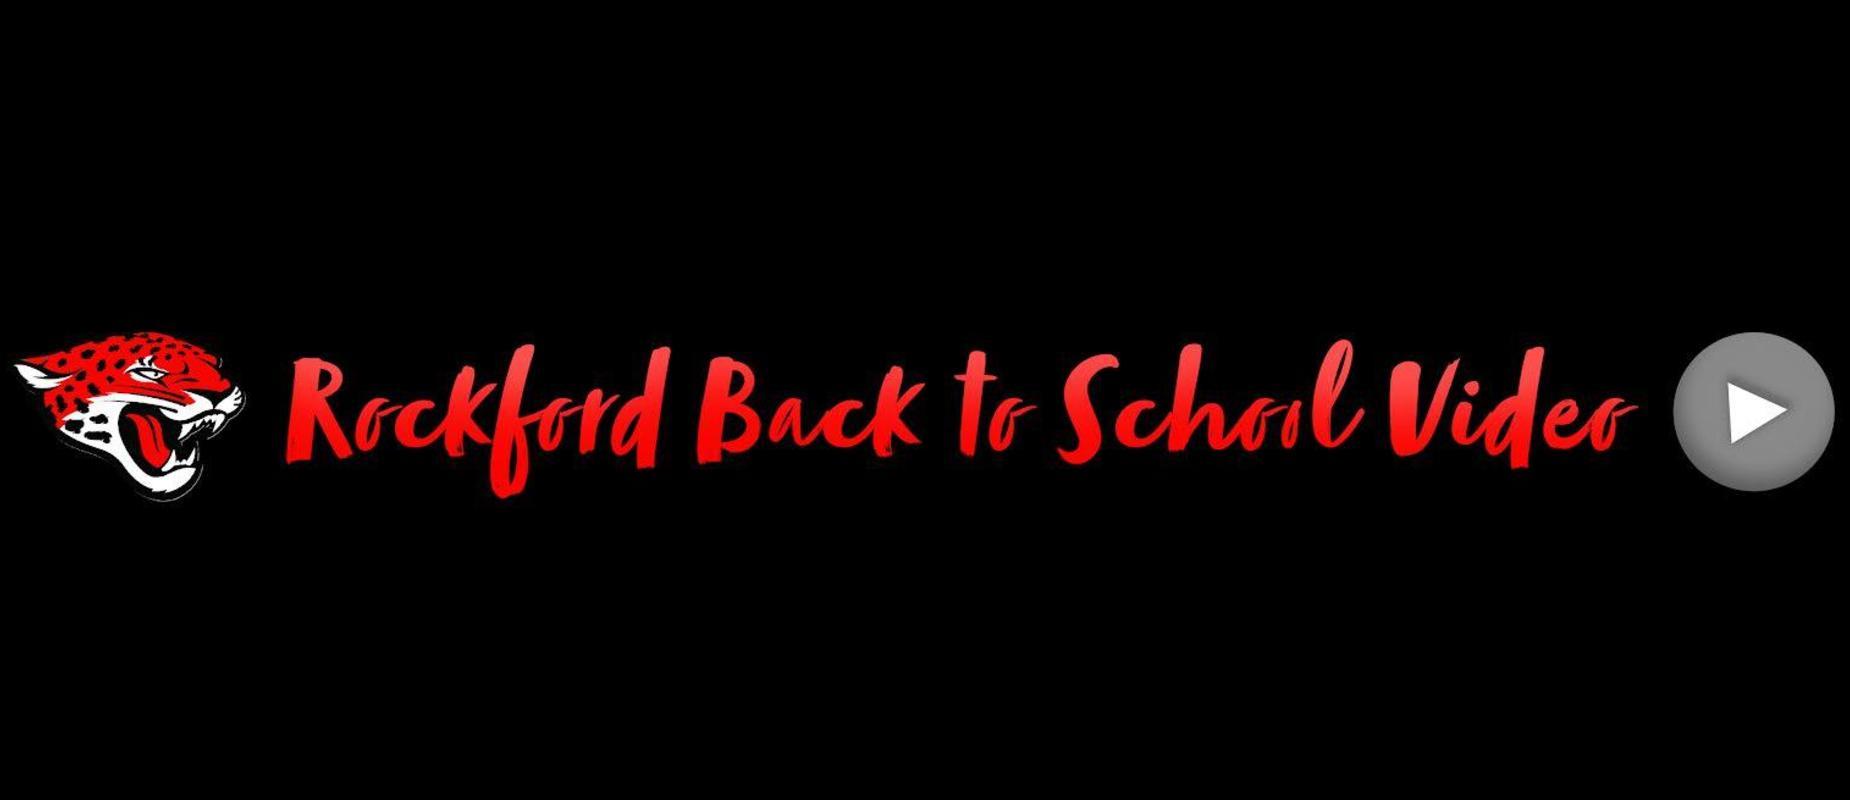 Rockford Back to School Videos